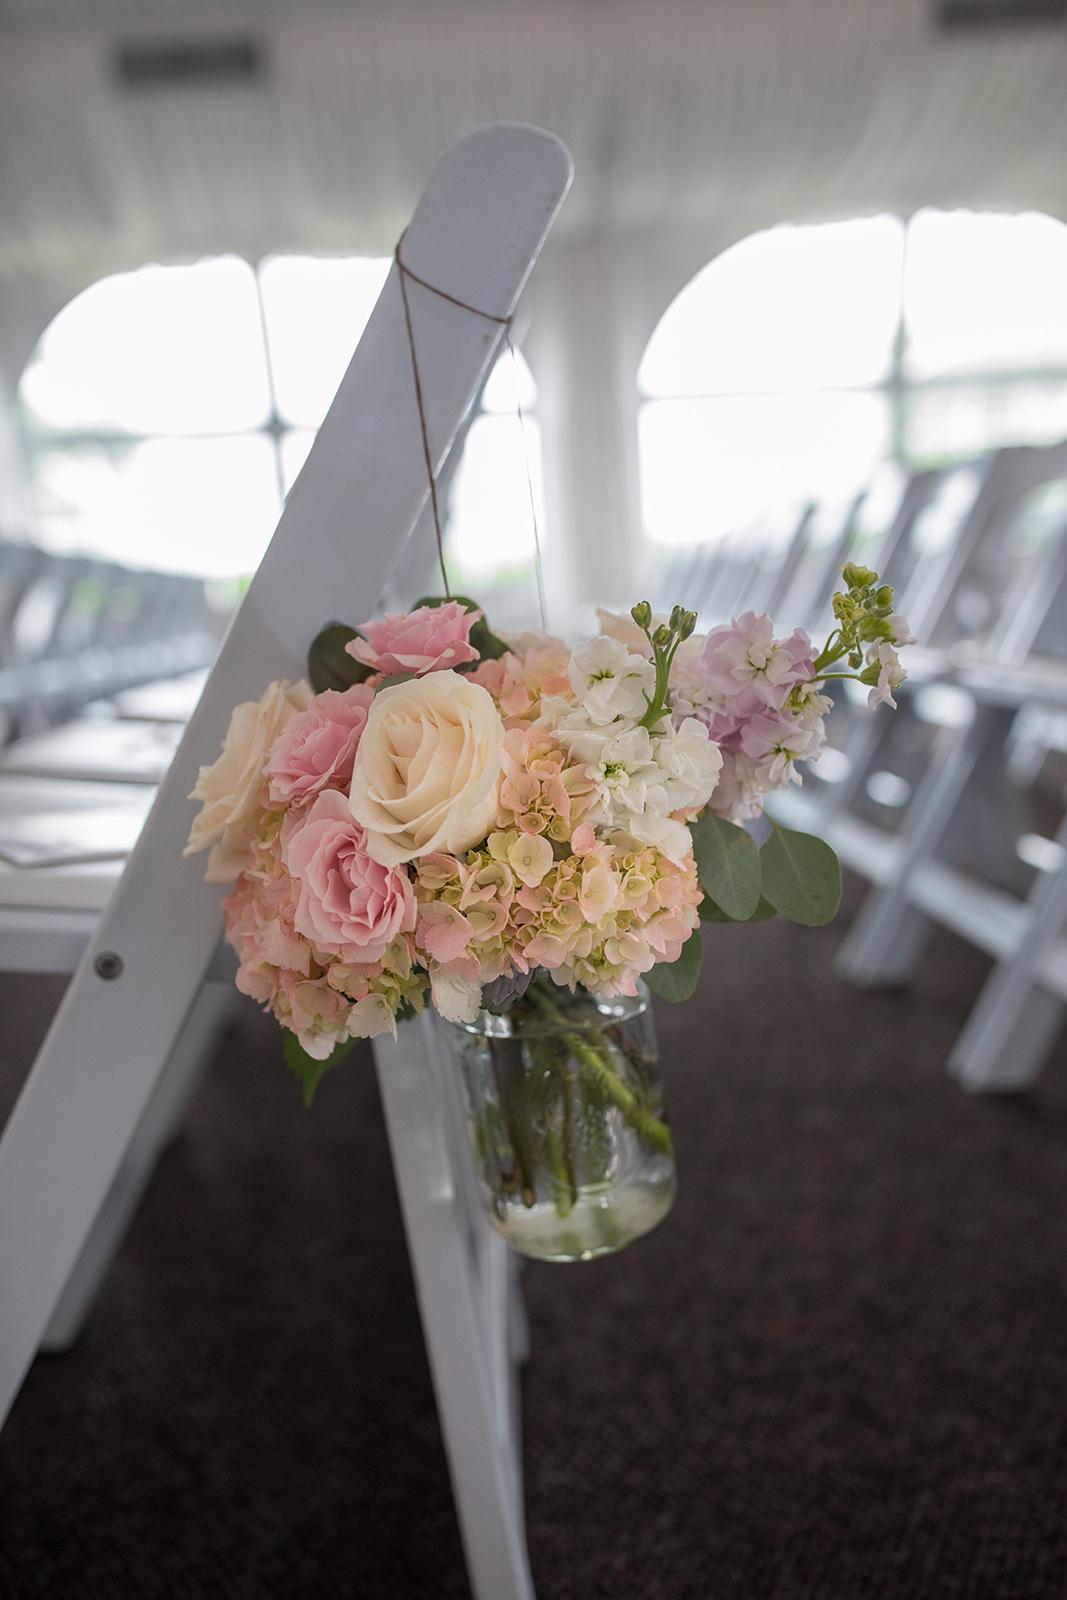 Le Cape Weddings - Sumeet and Chavi - Detalis Ceremony --2.jpg